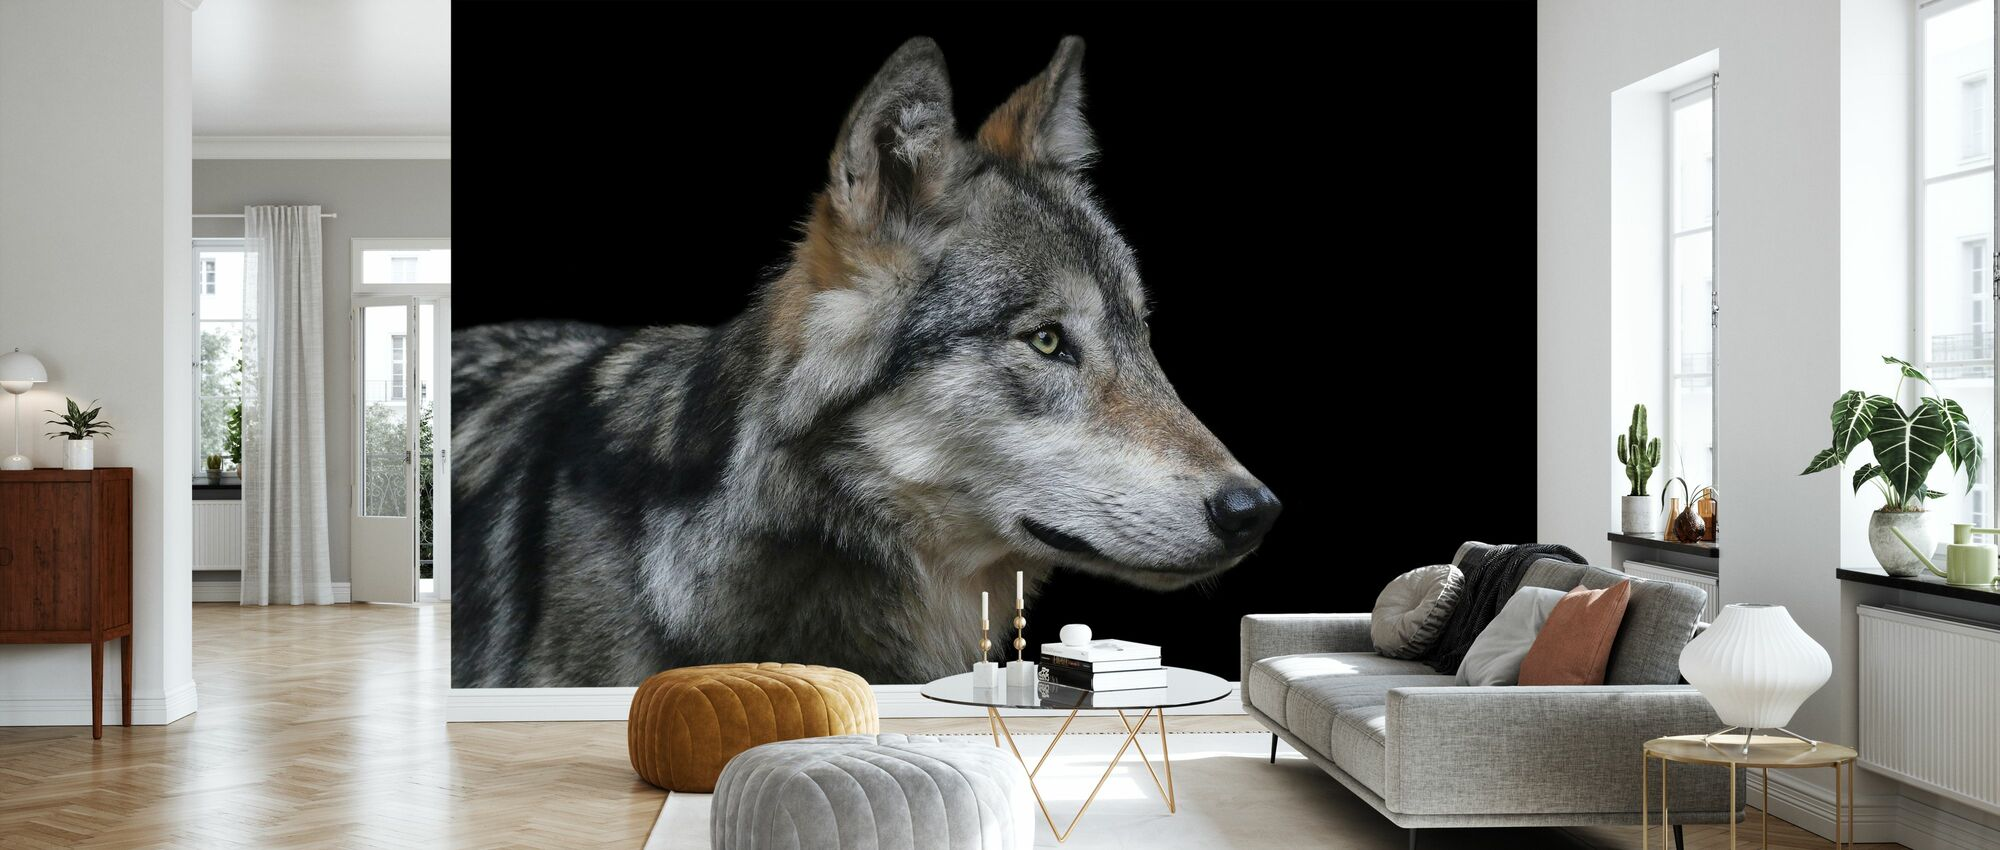 Wolf - Wallpaper - Living Room